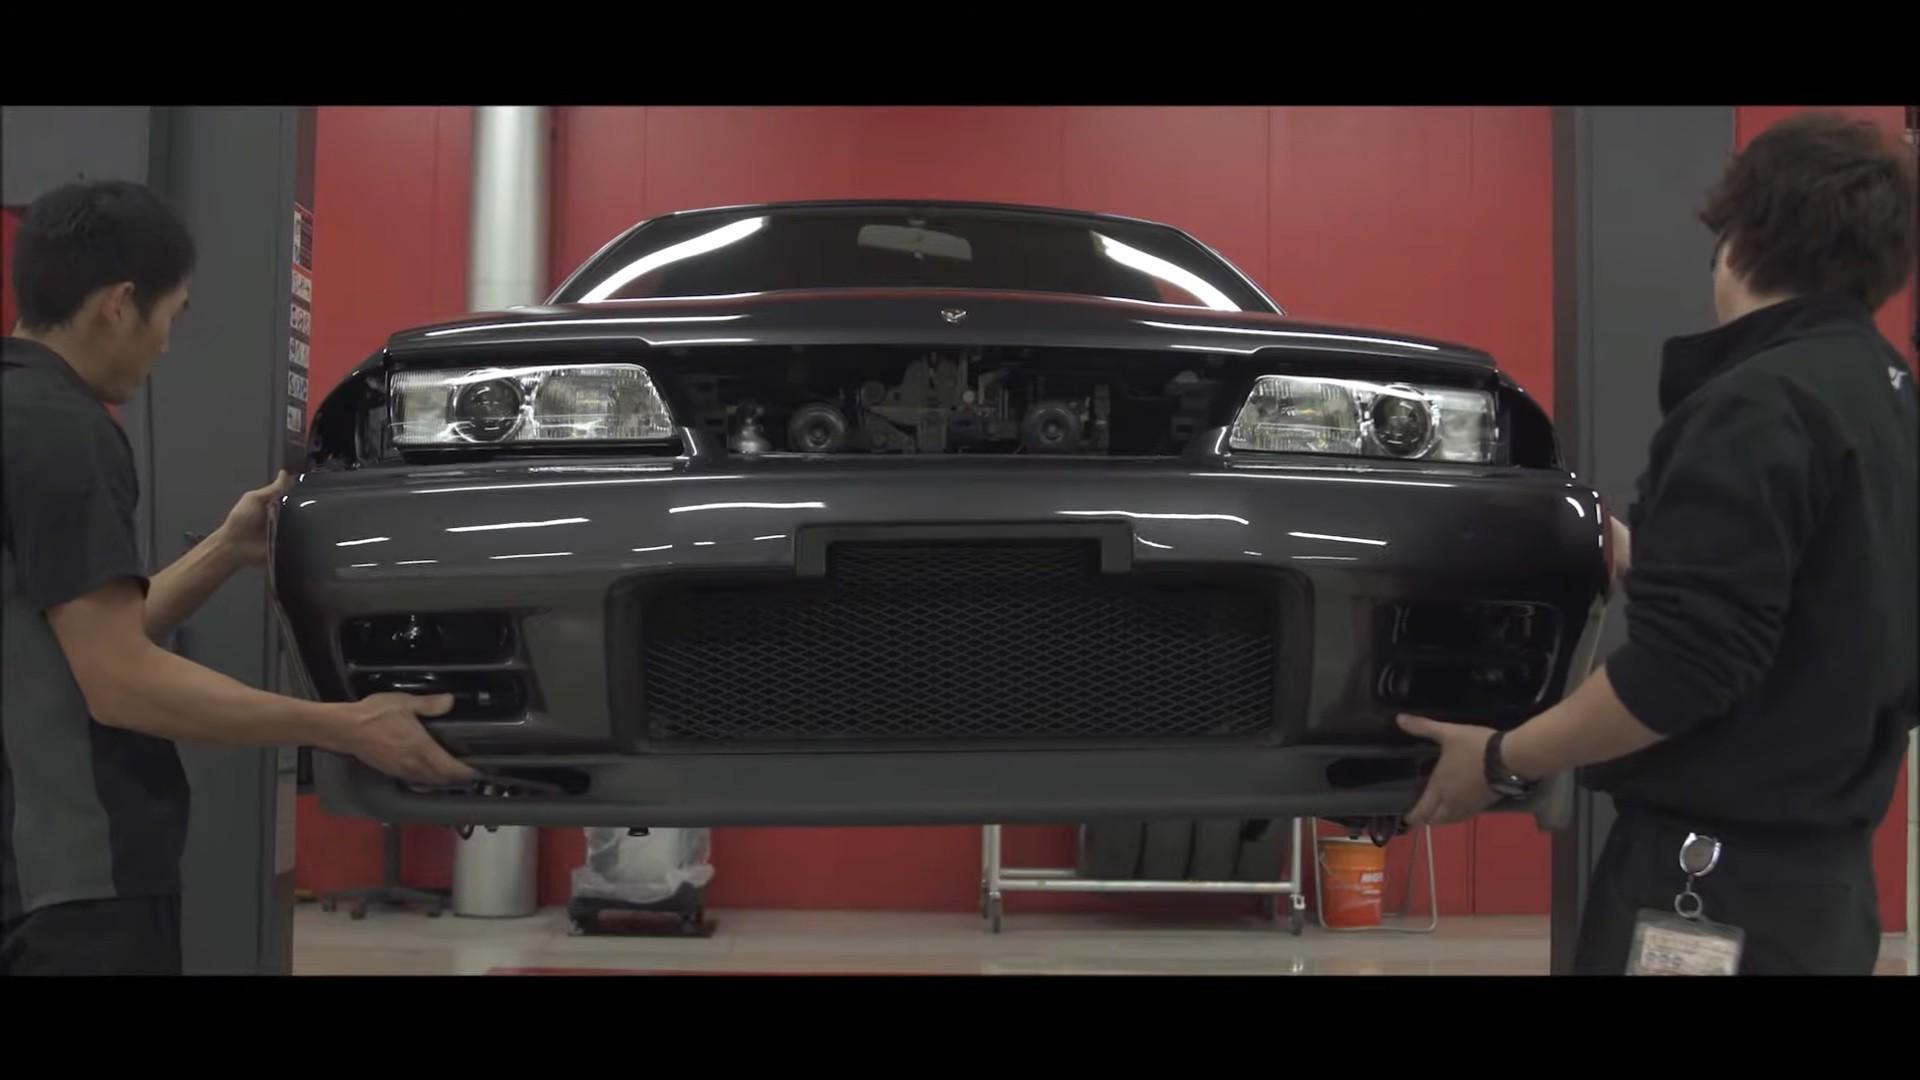 Nissan-Skyline-R32-GT-R-Nismo-restored-6